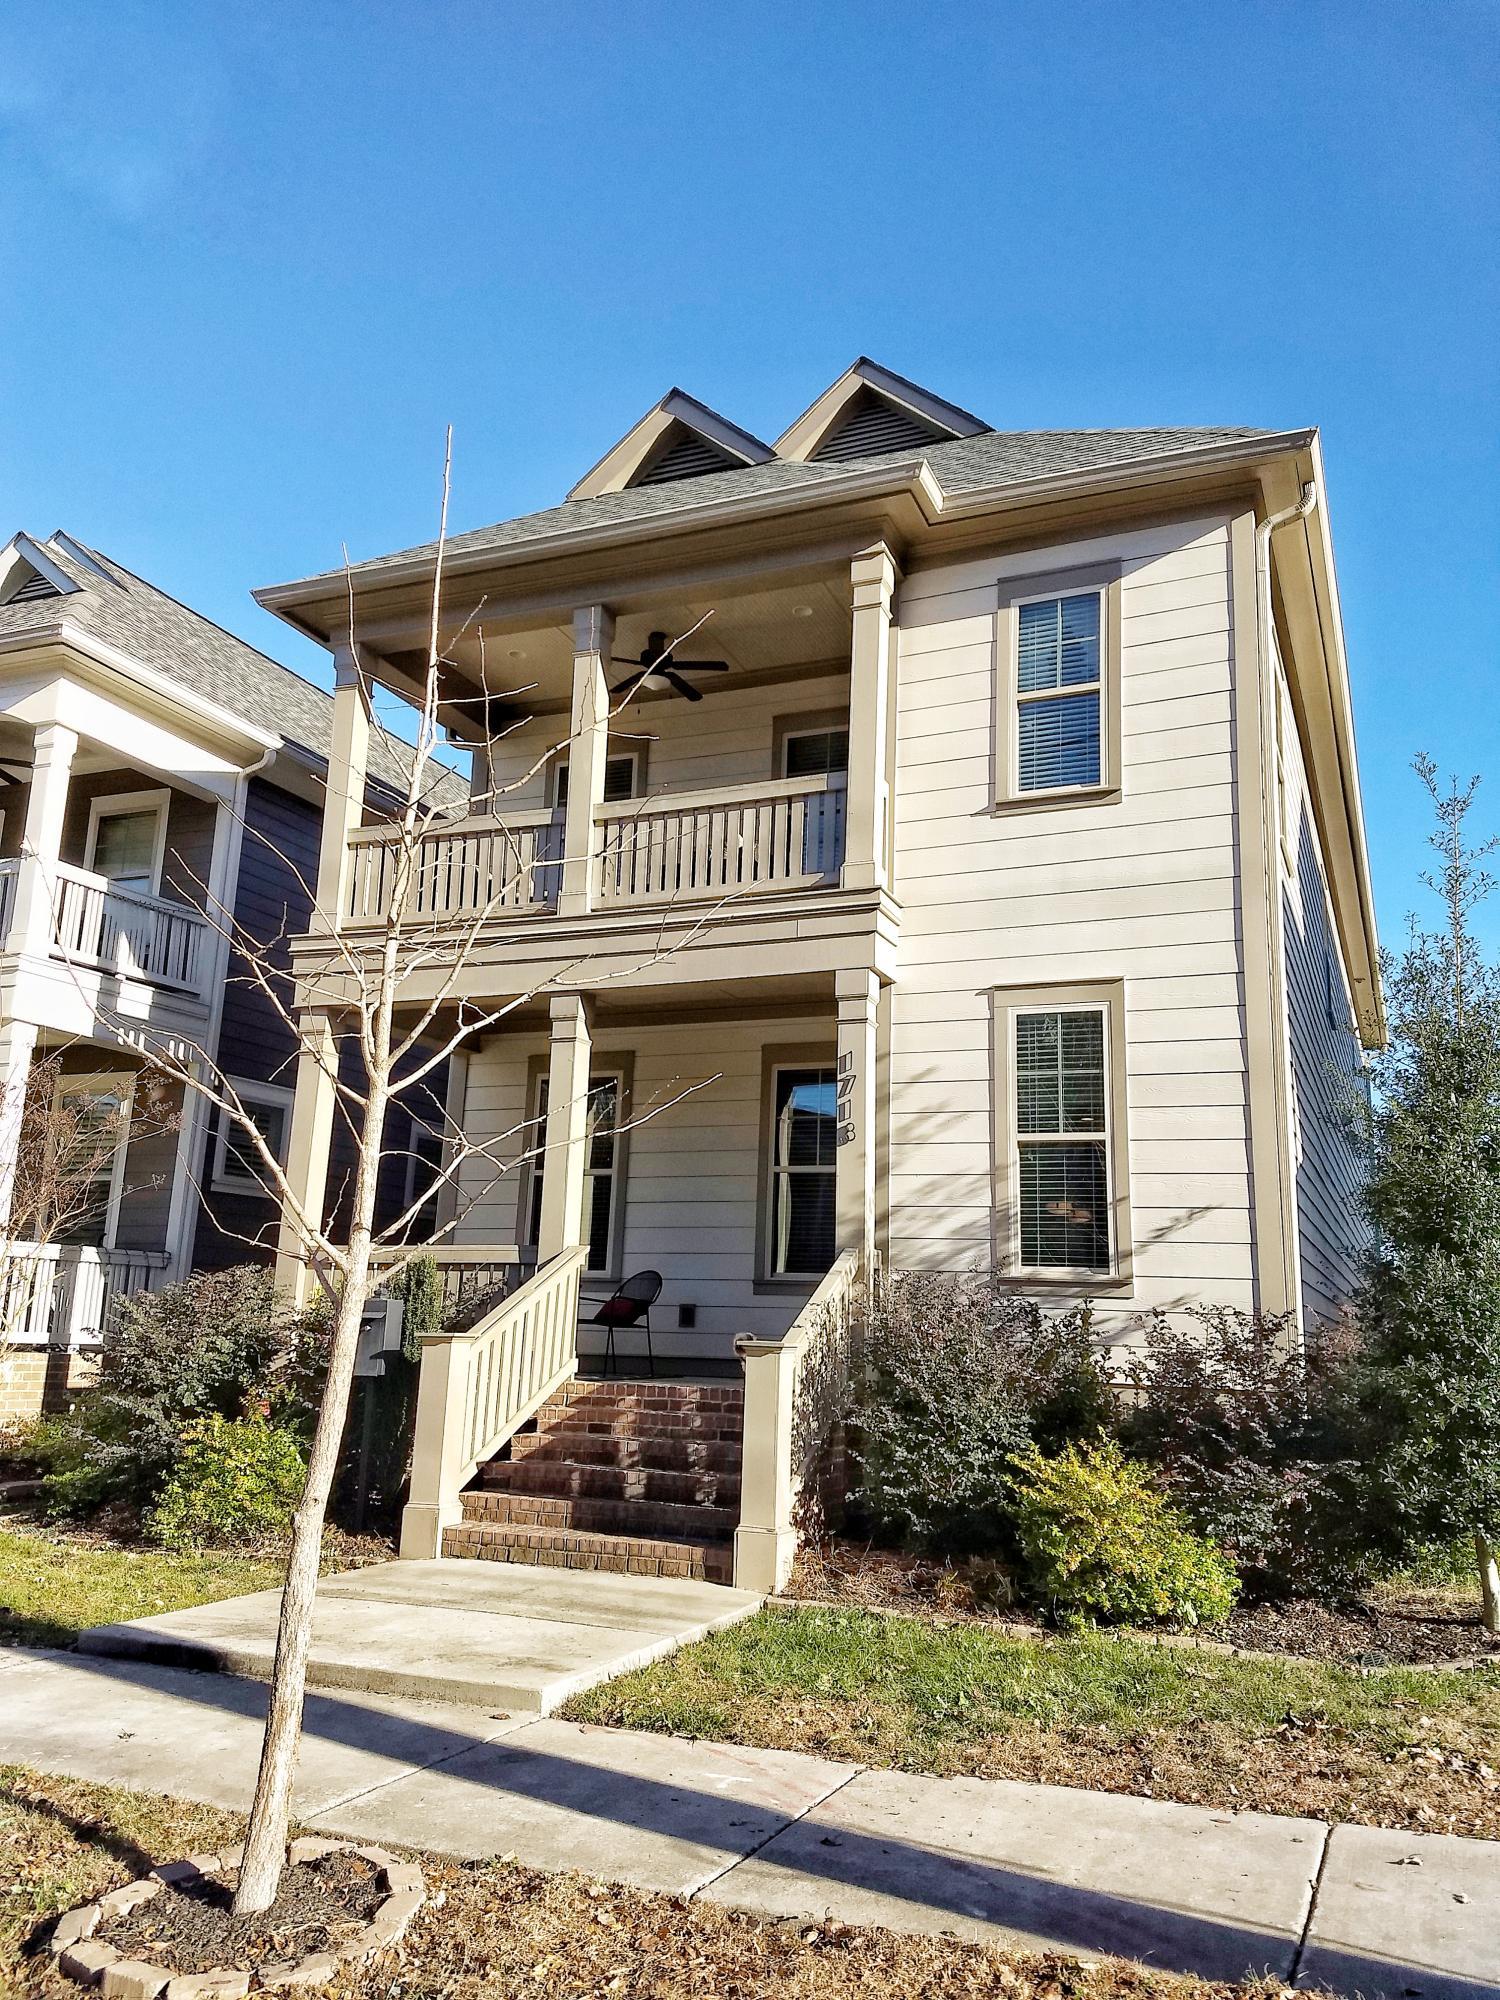 1718 Long St, Chattanooga, TN 37408